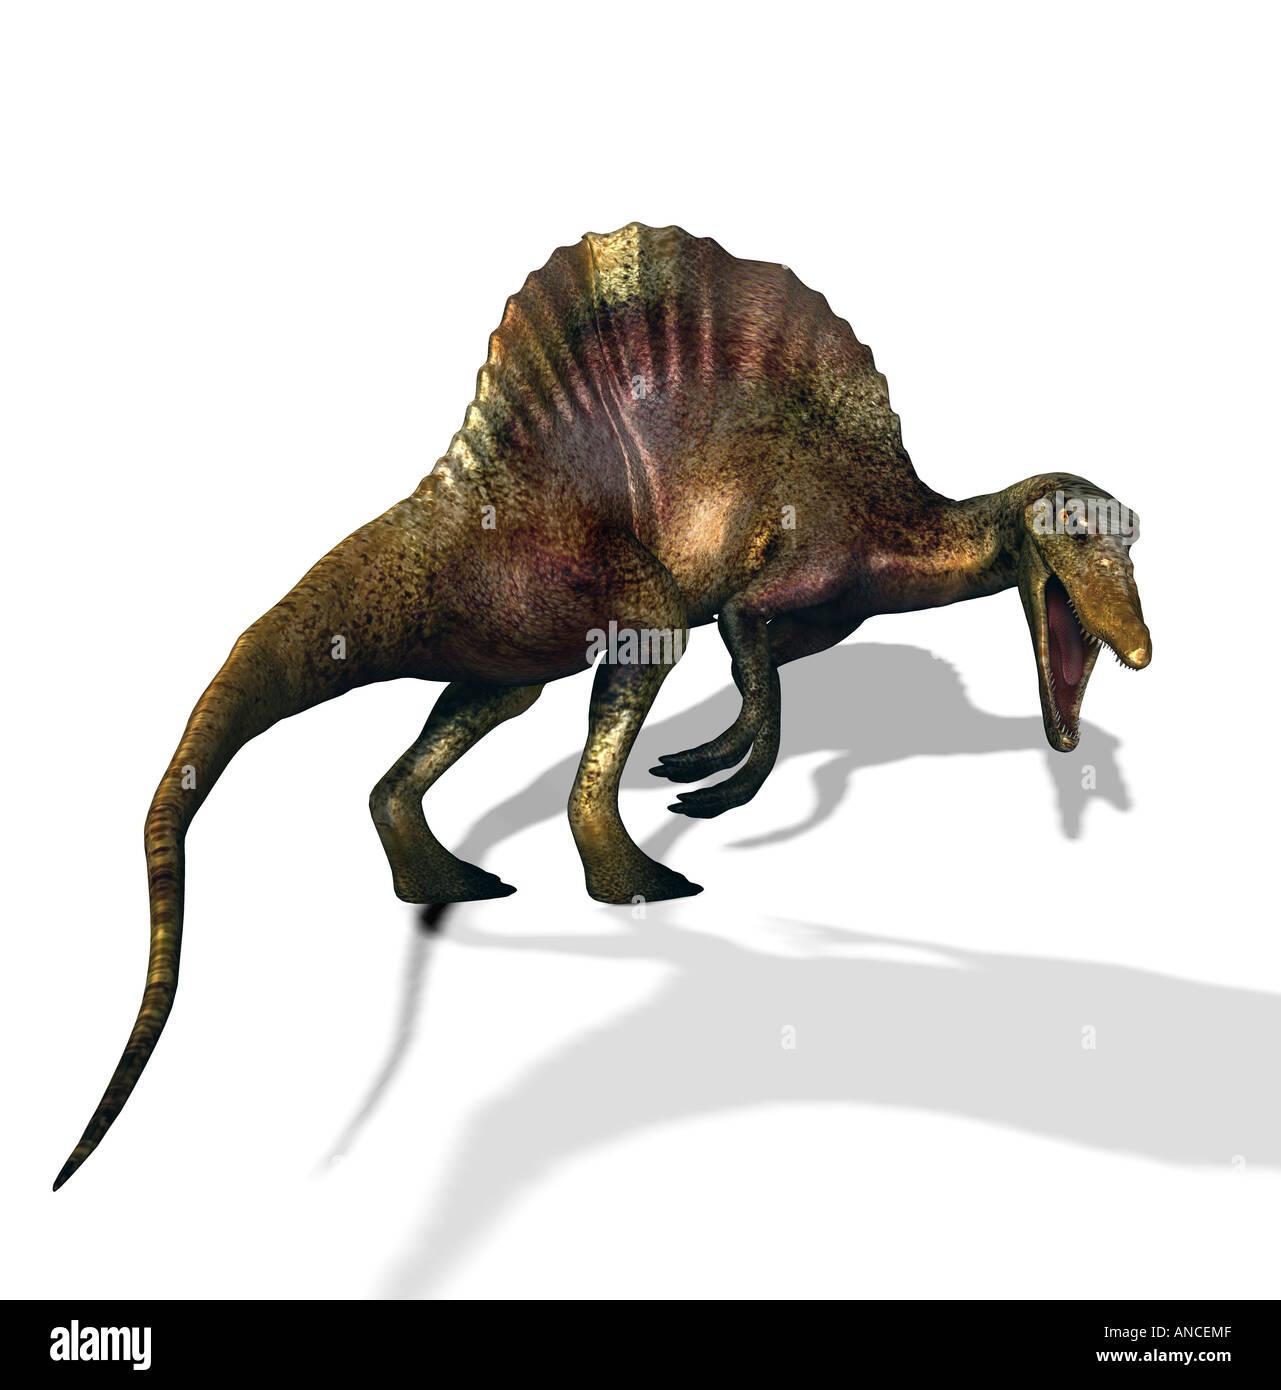 dinosaur Spinosaurus - Stock Image